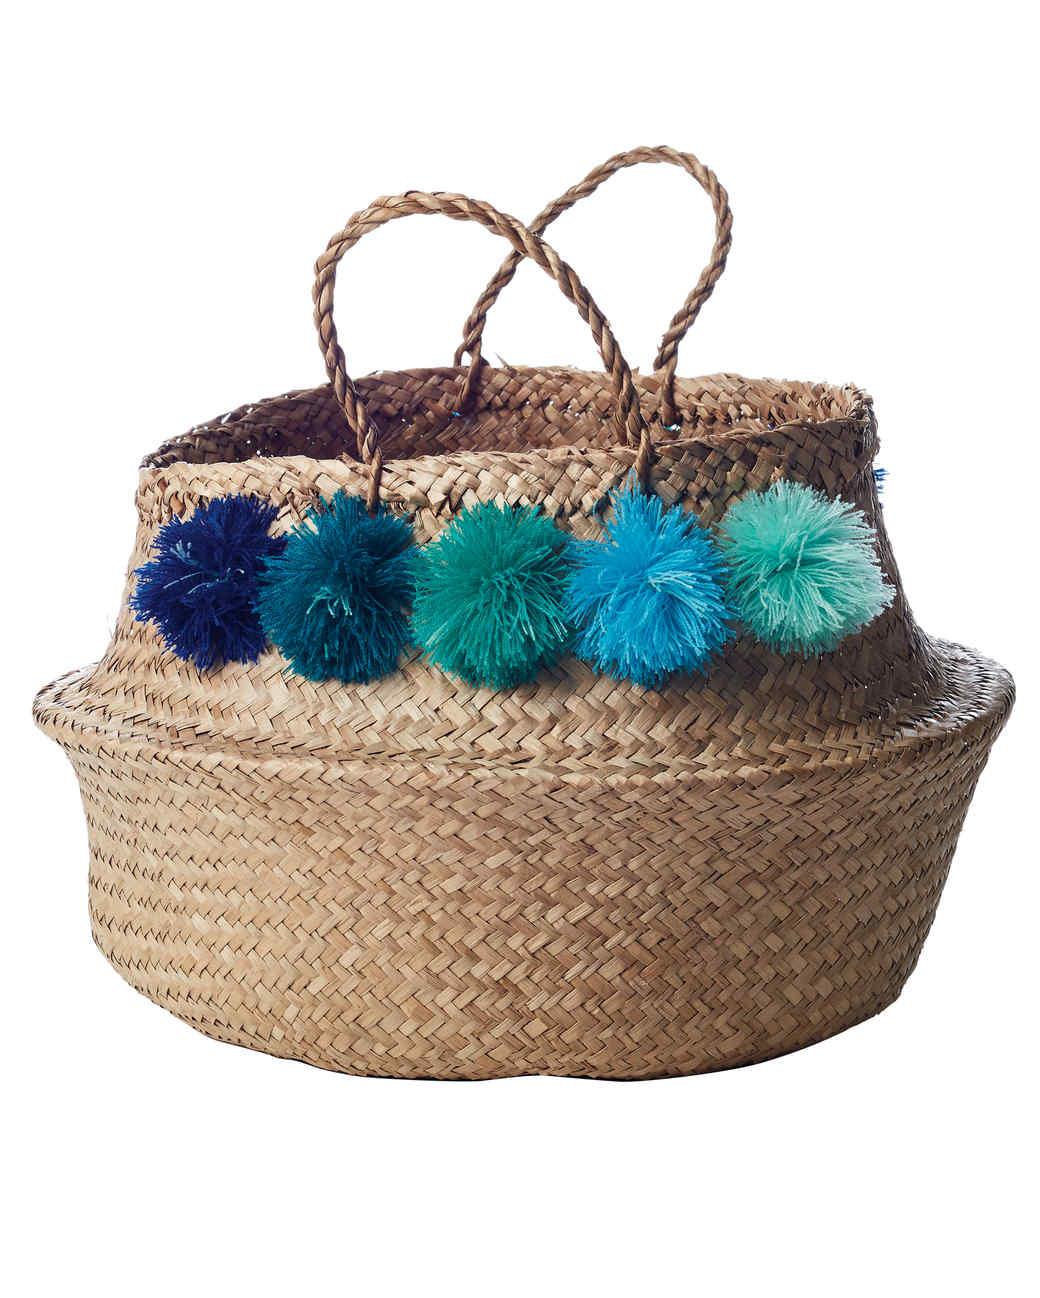 eliza-gran-basket-blue-027-d112214.jpg